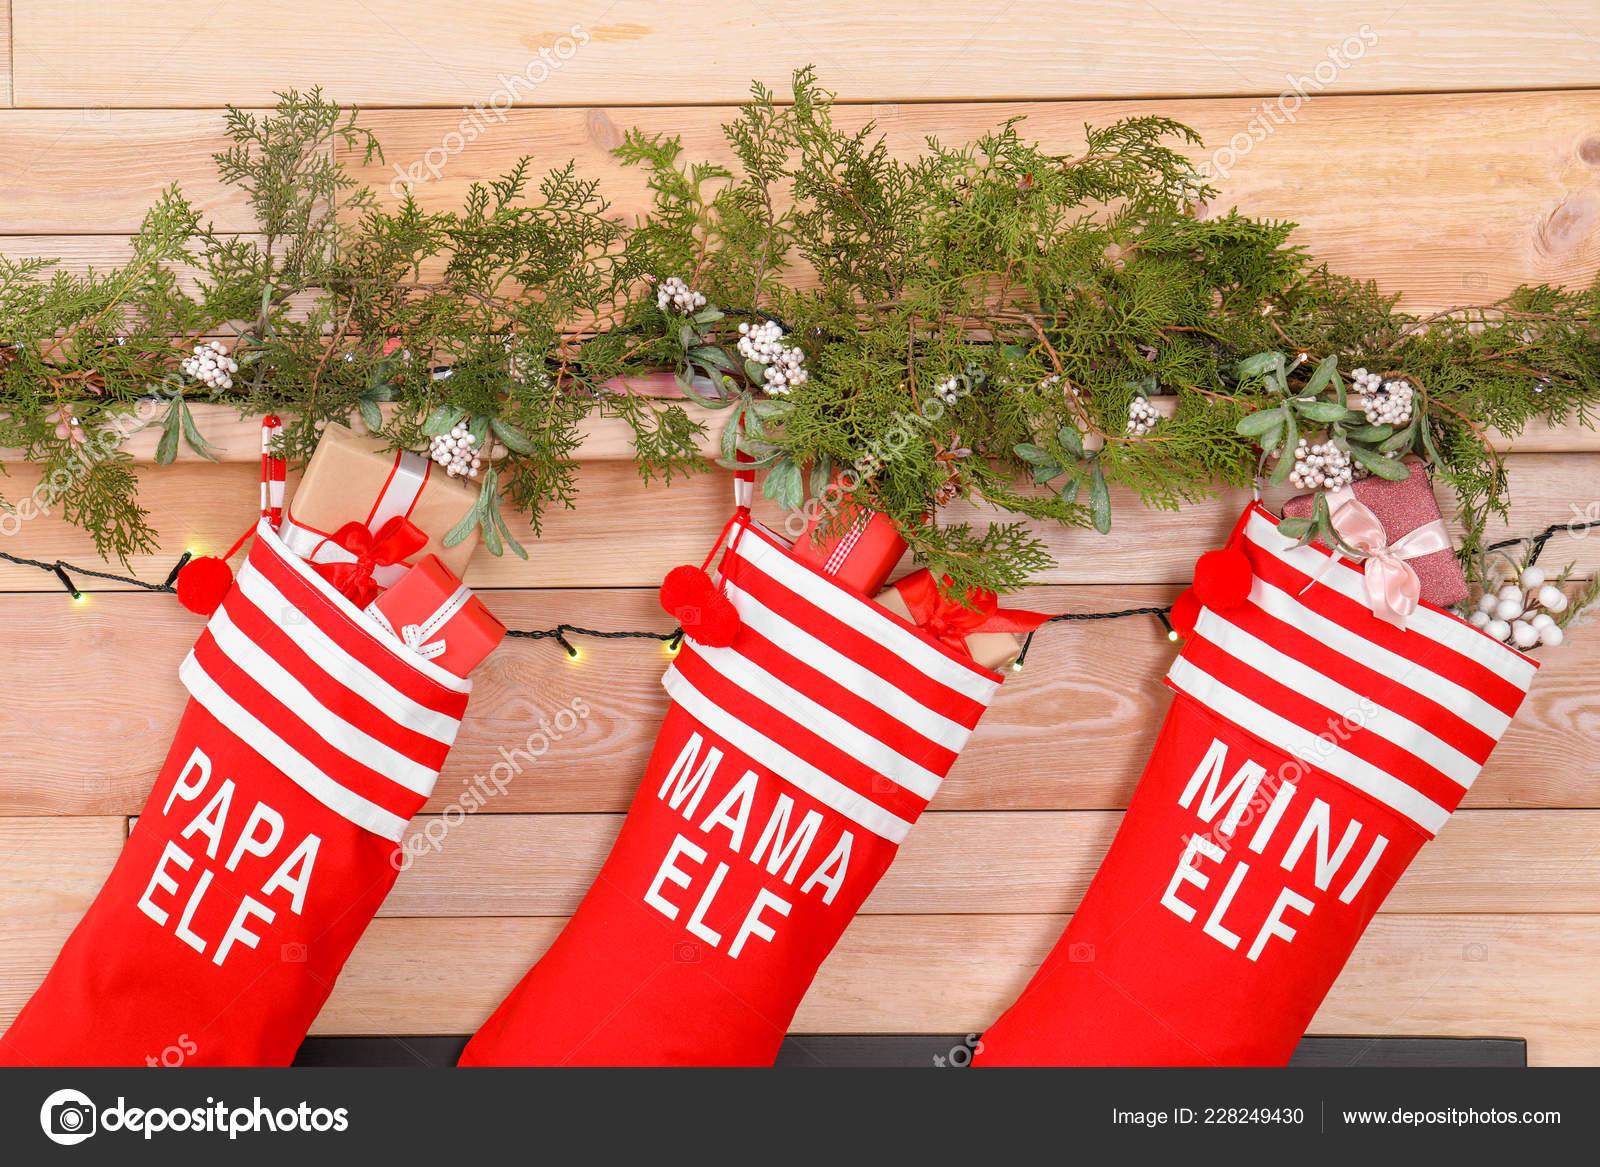 c2333c4d8aa Christmas stockings hanging on wooden wall. Festive interior — Photo by  liudmilachernetska gmail.com